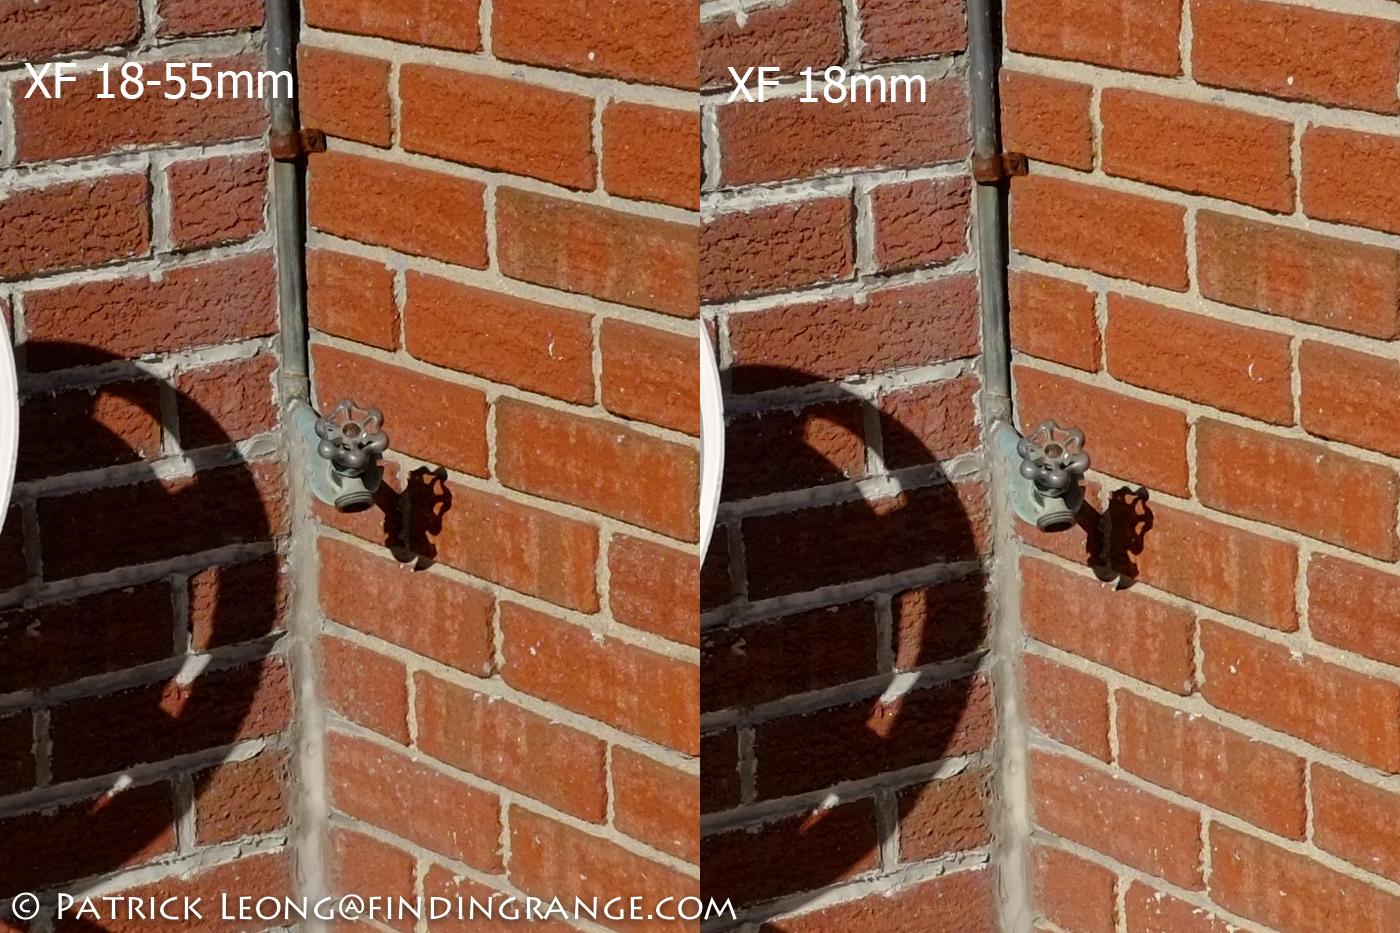 Comparison Test: Fuji 18-55mm F2.8-4 R Lens Vs. XF 18mm F2.0 R Lens